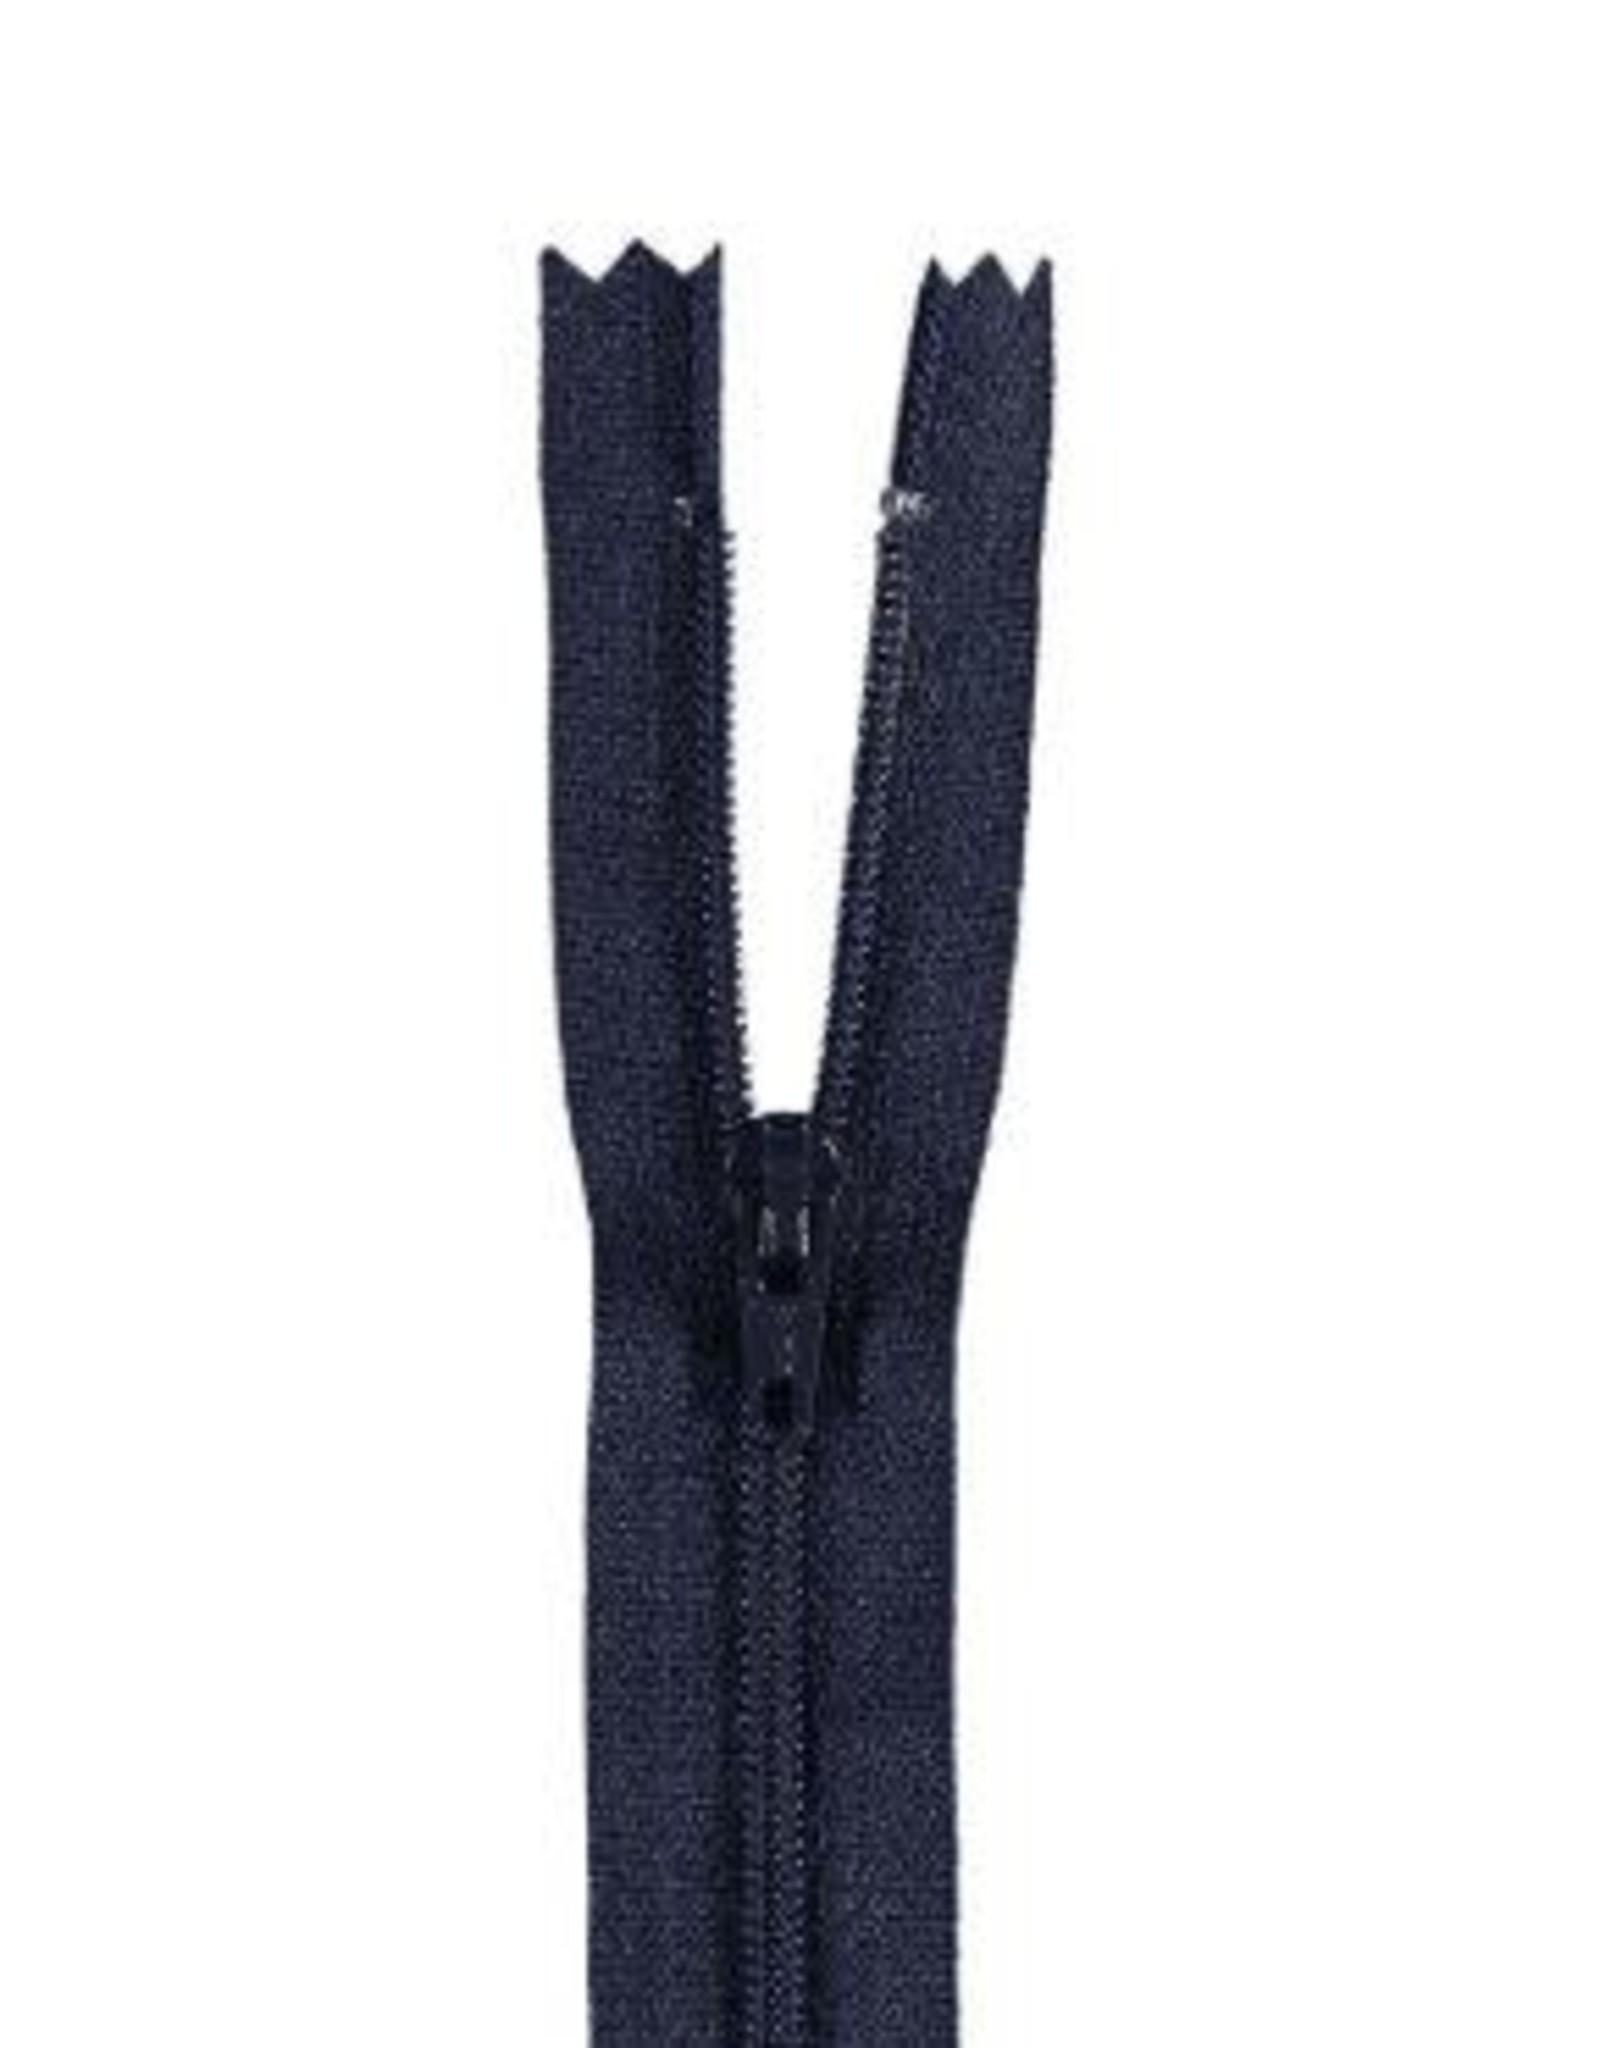 YKK Spiraalrits niet-DB 3mm d. blauw gr 168-20cm